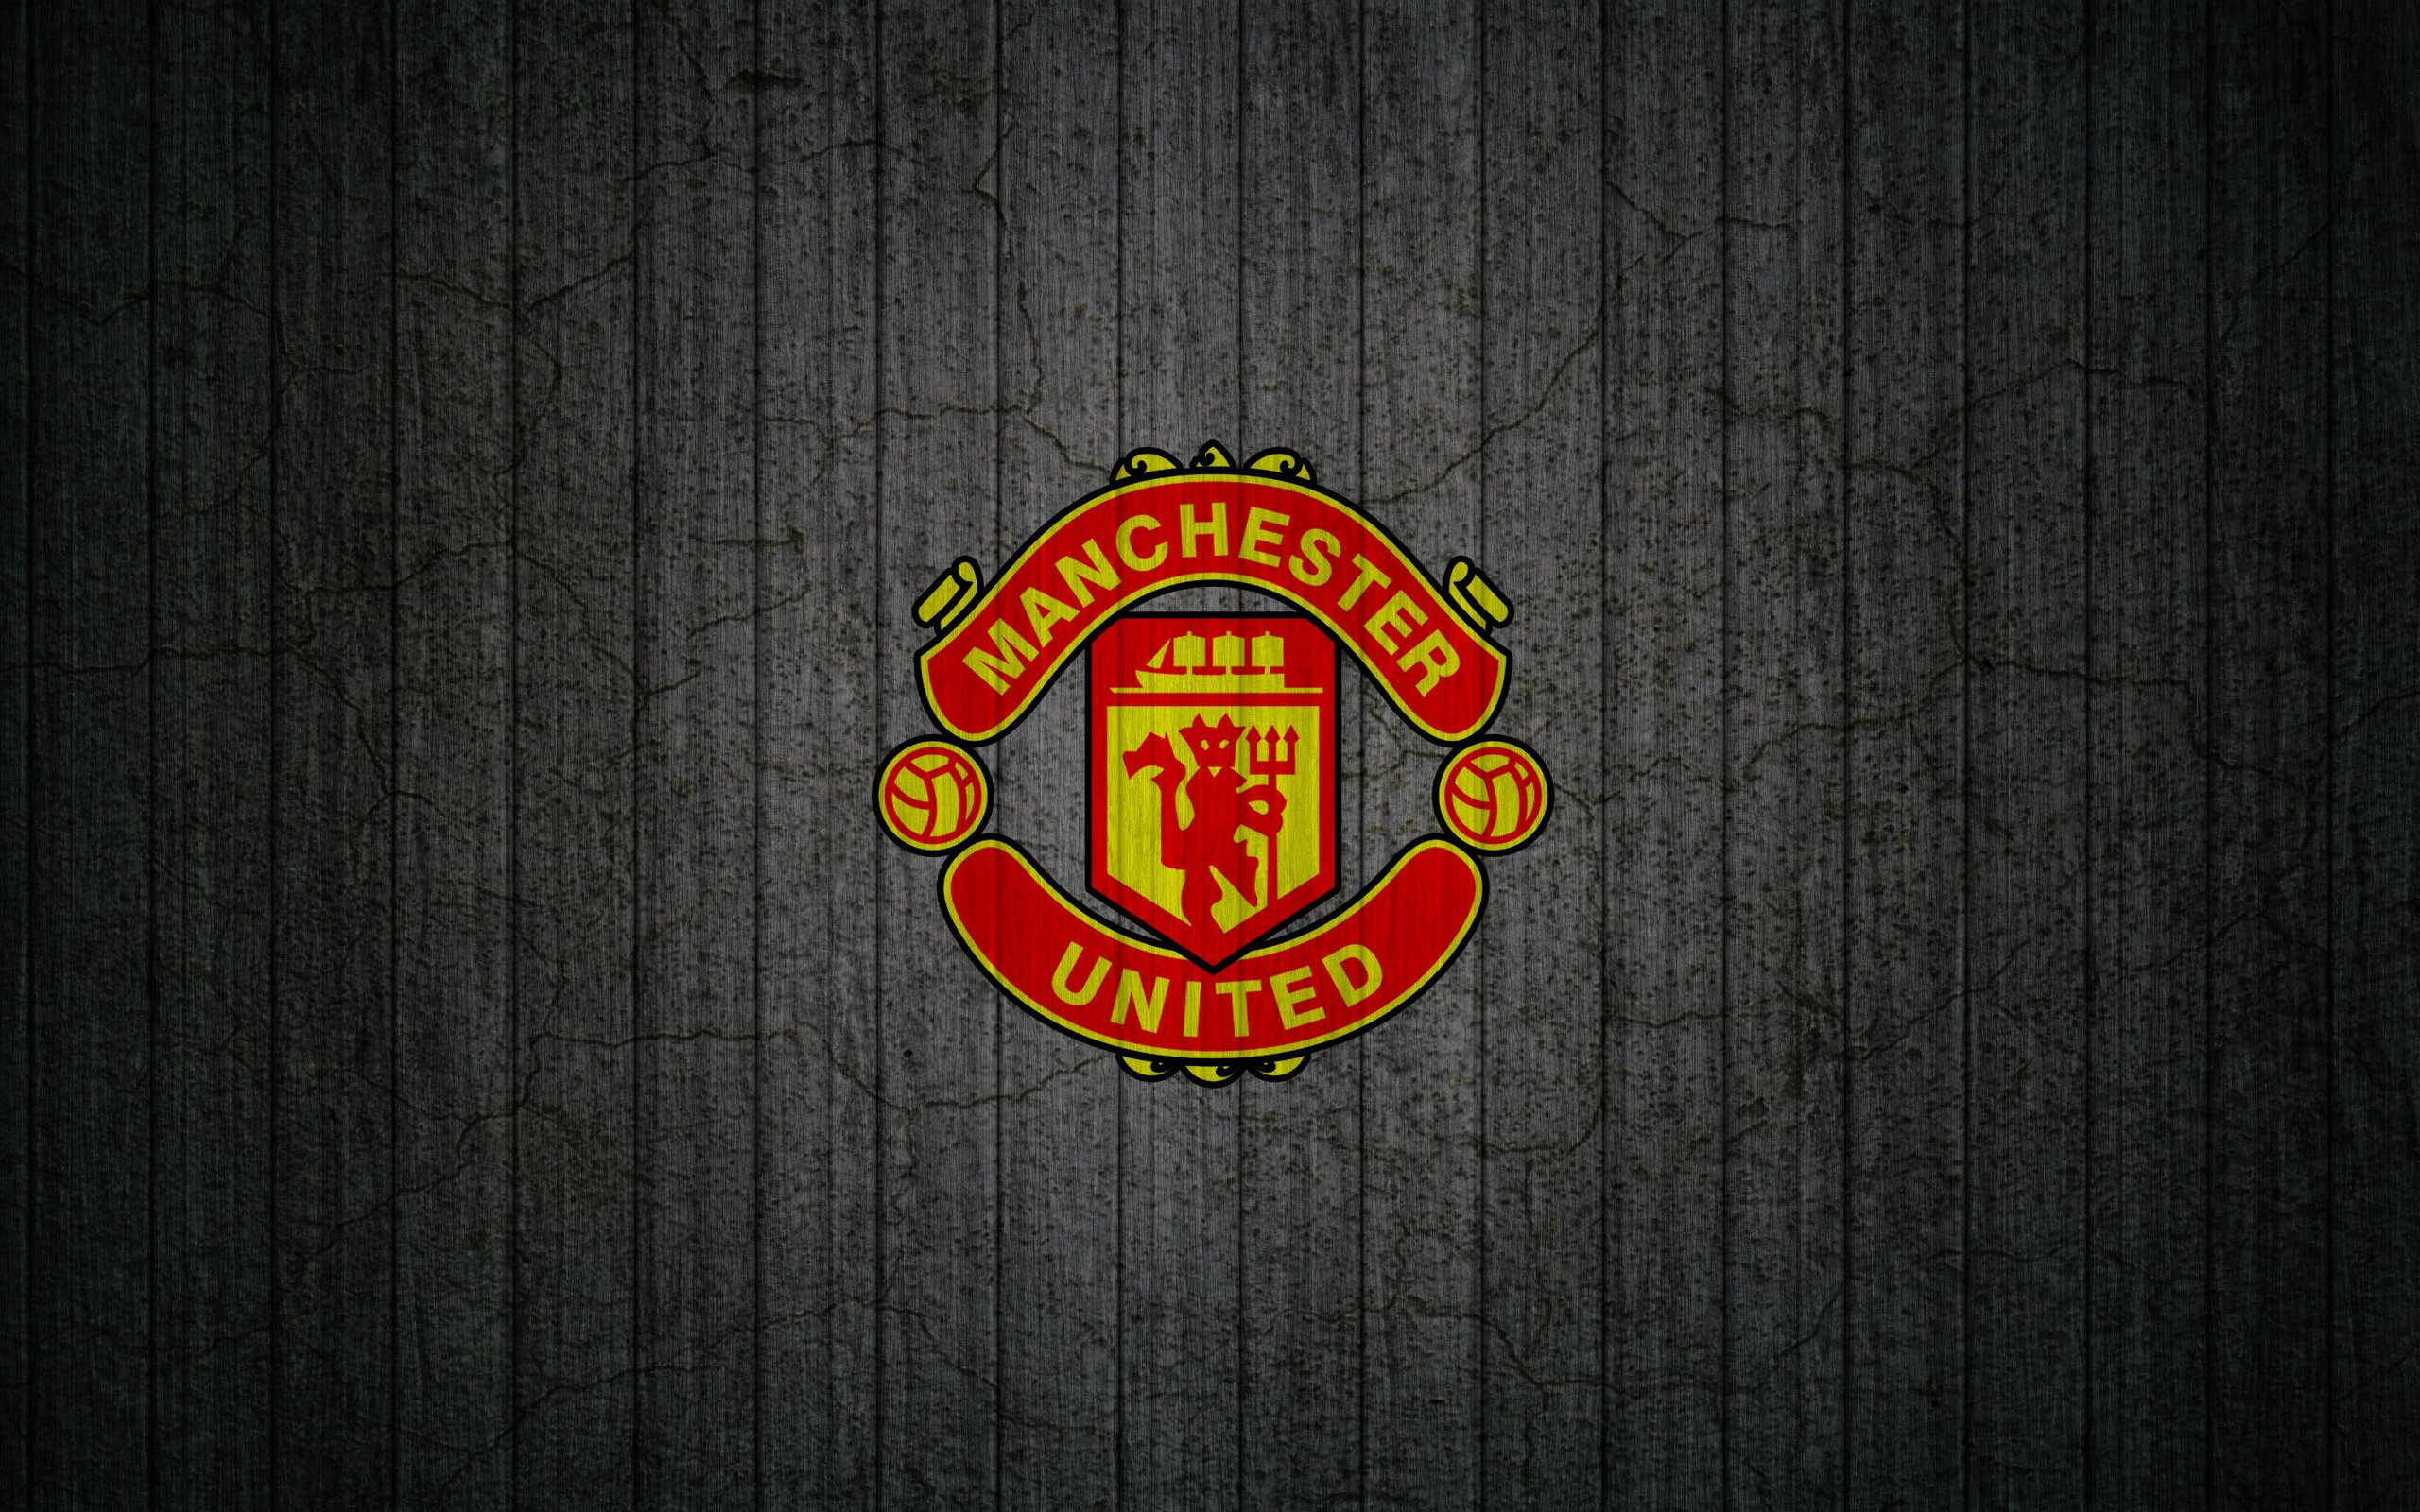 Манчестер юнайтед в катинках